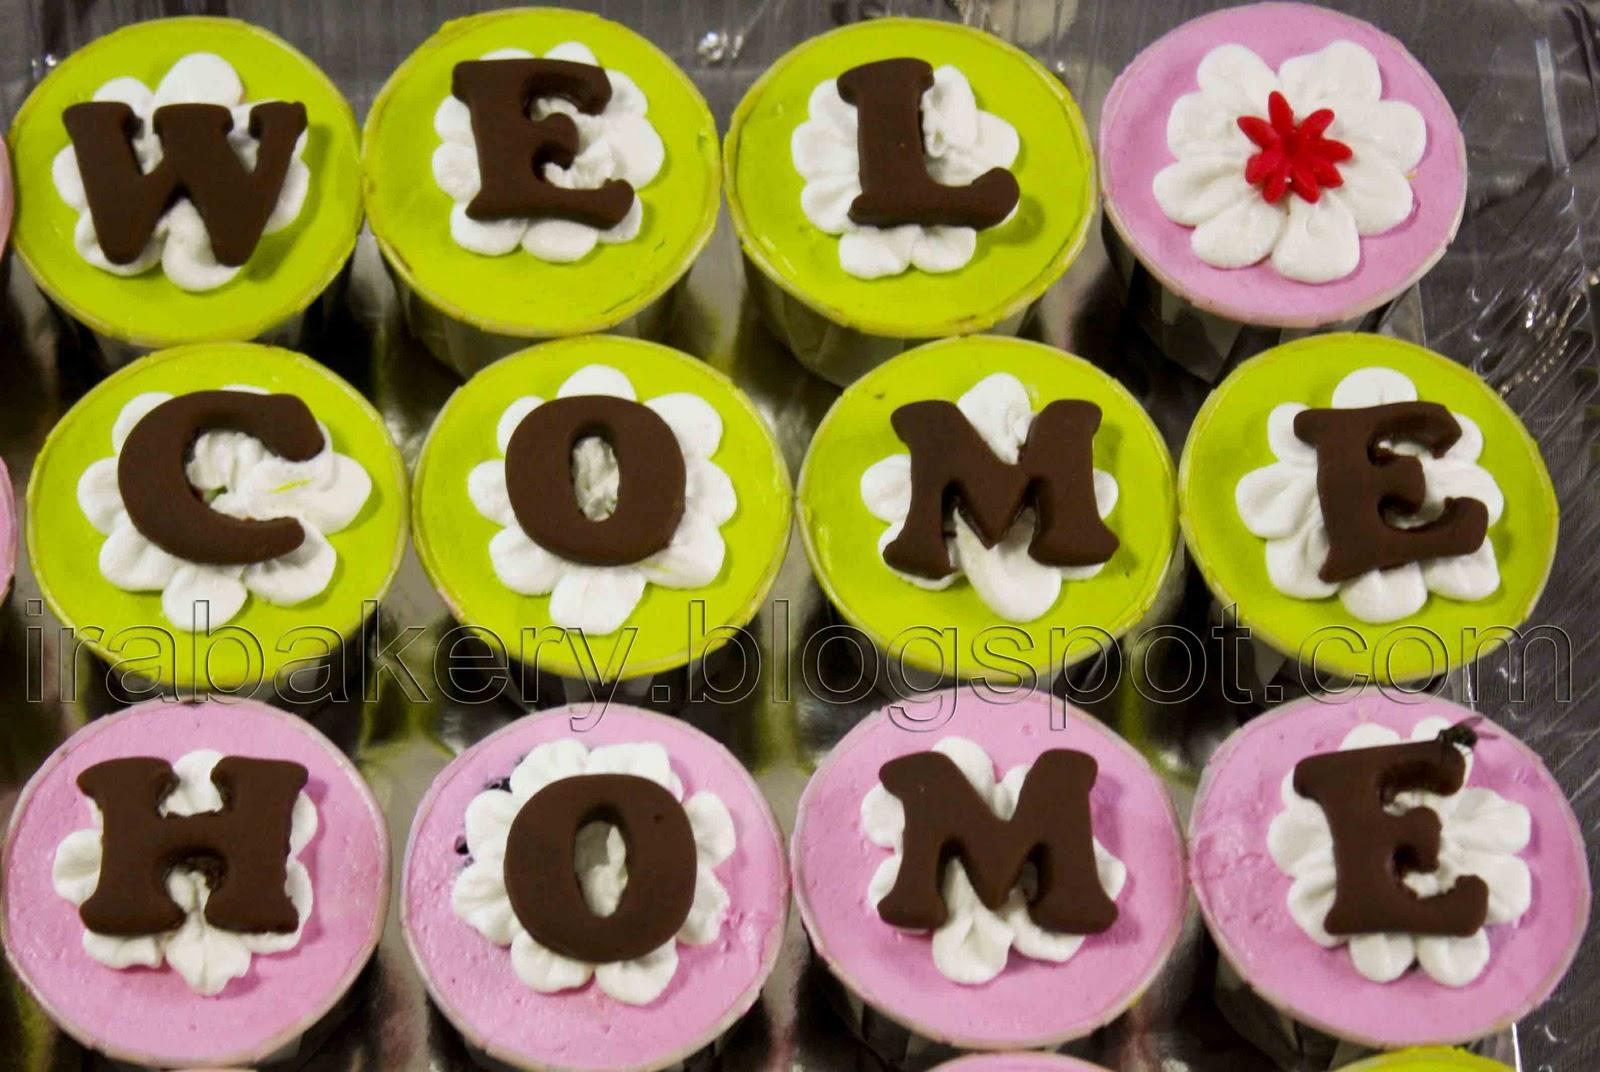 Deco Cakes Cupcakes Cheese Cake Kek Lapis Sarawak In Kuching Welcome Back To Kuching